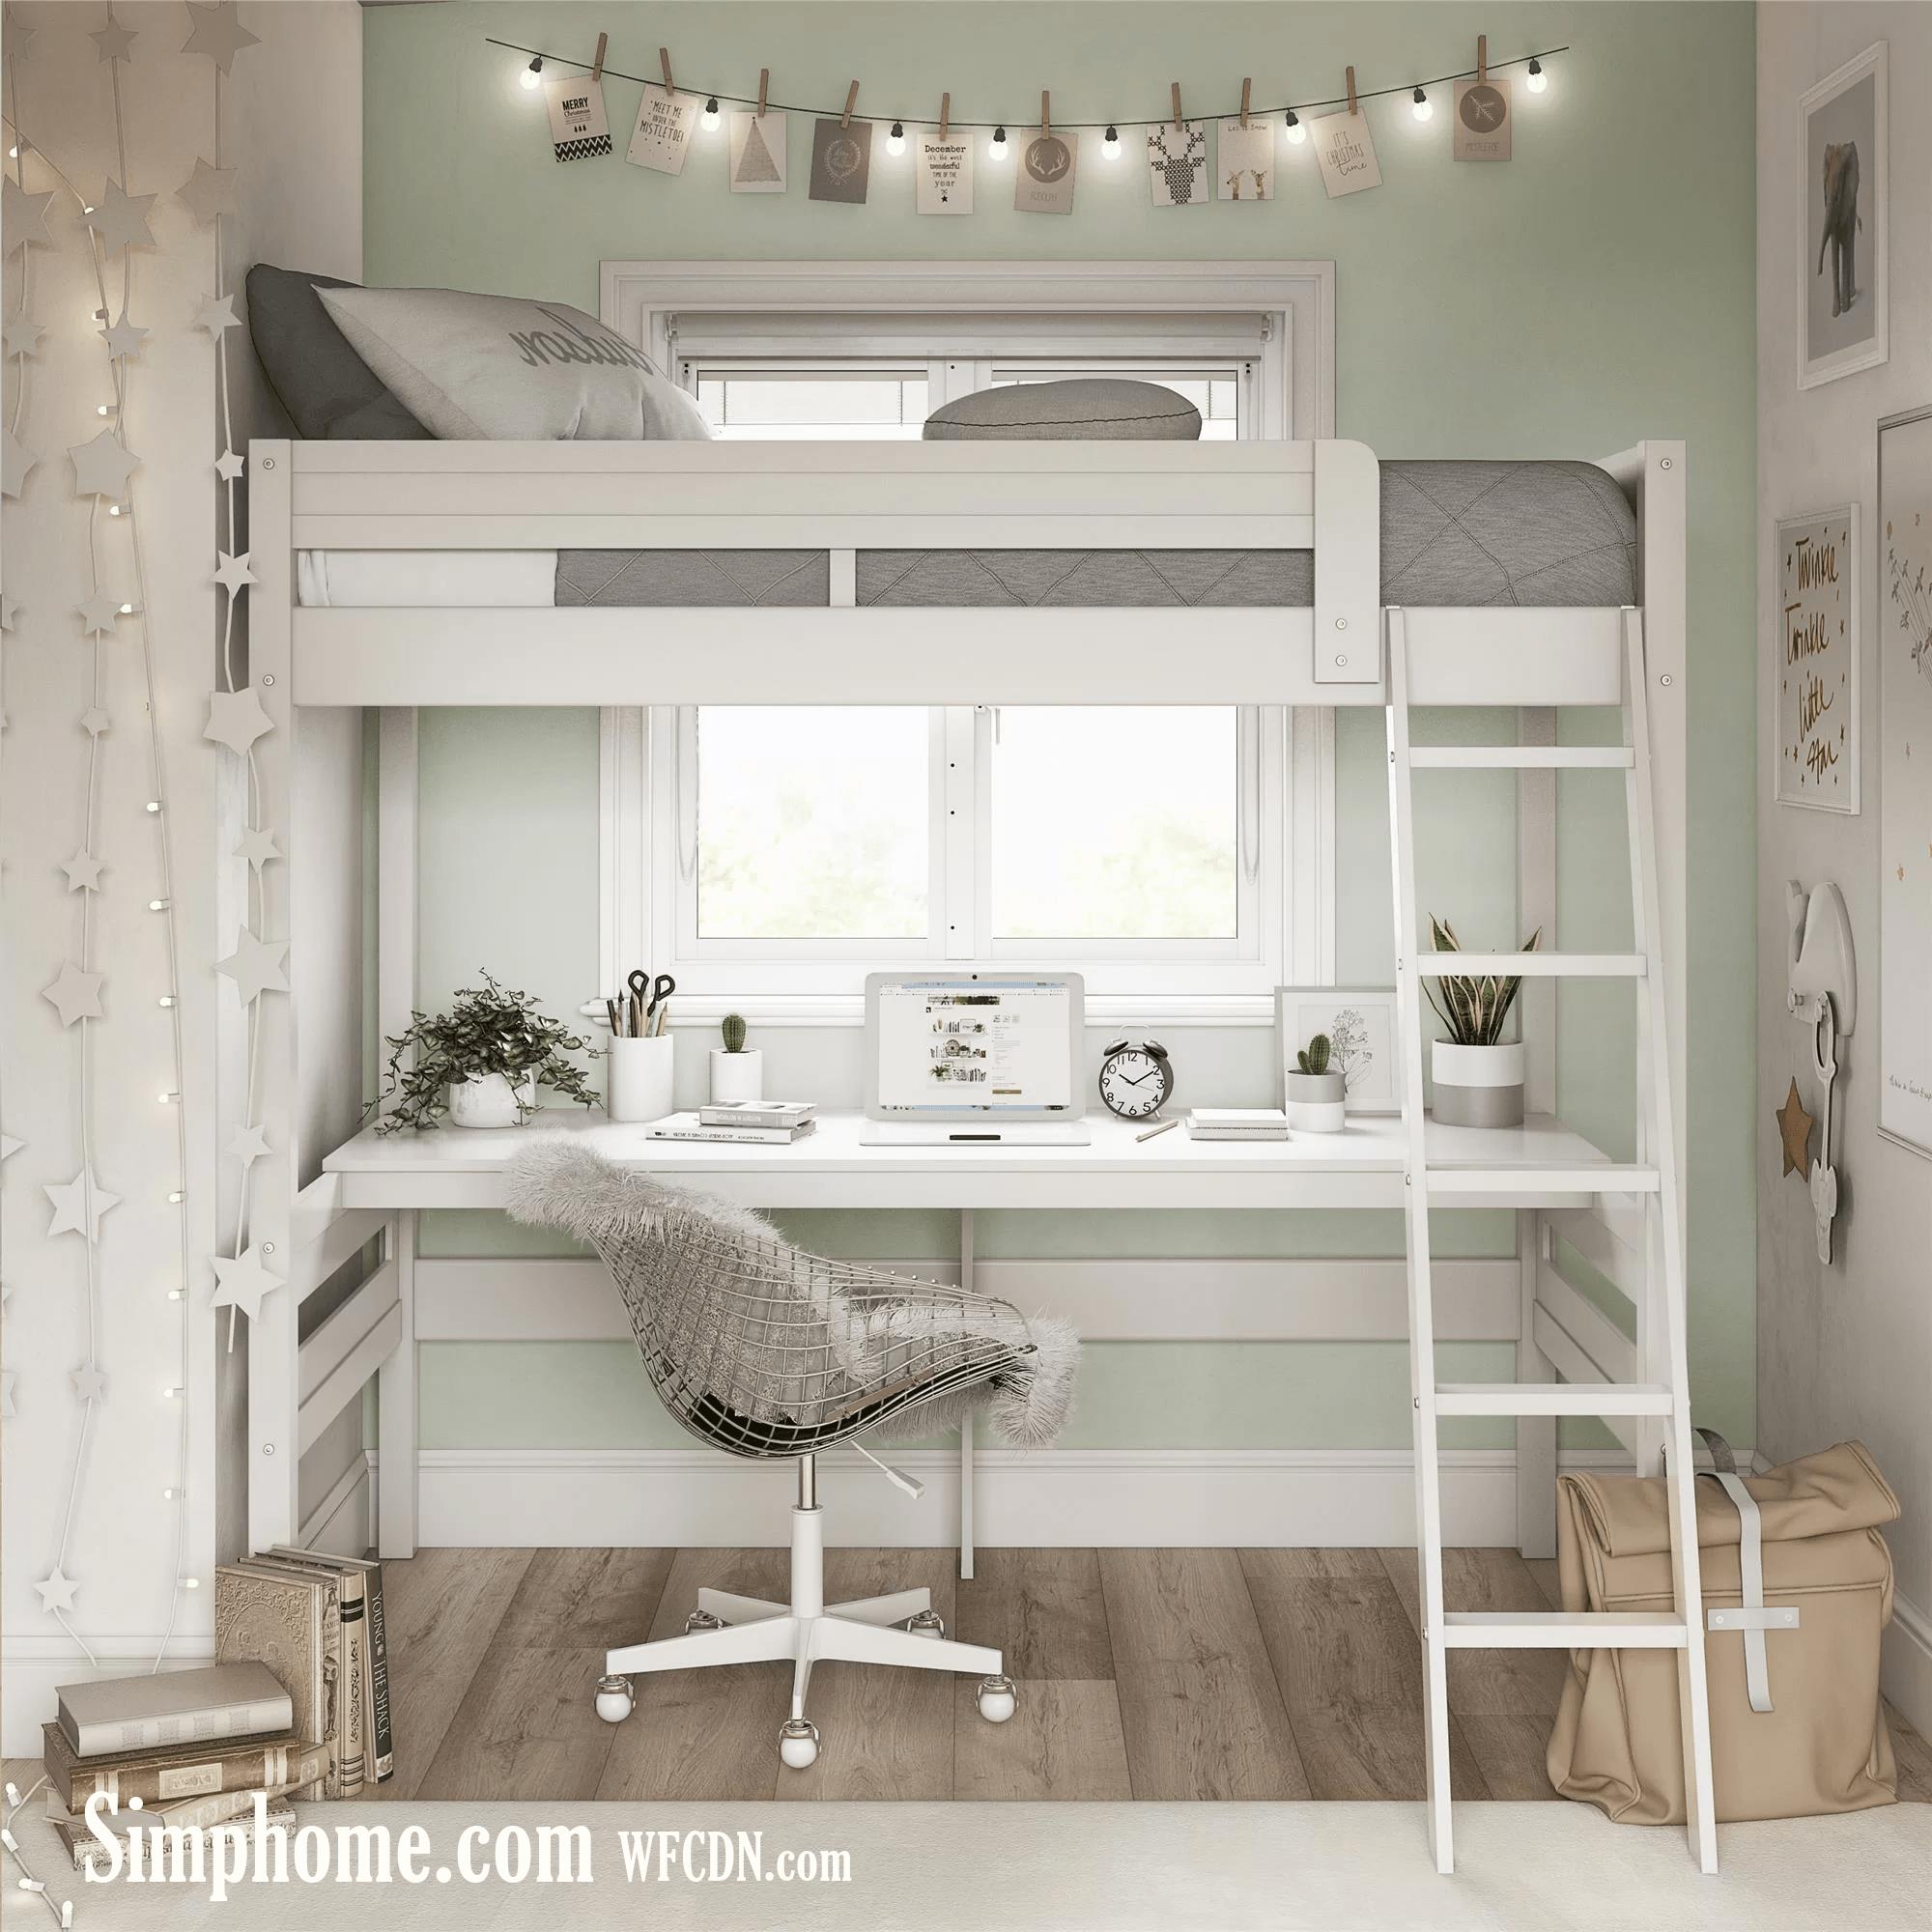 1. Invest in a Loft Bed via Simphome.com